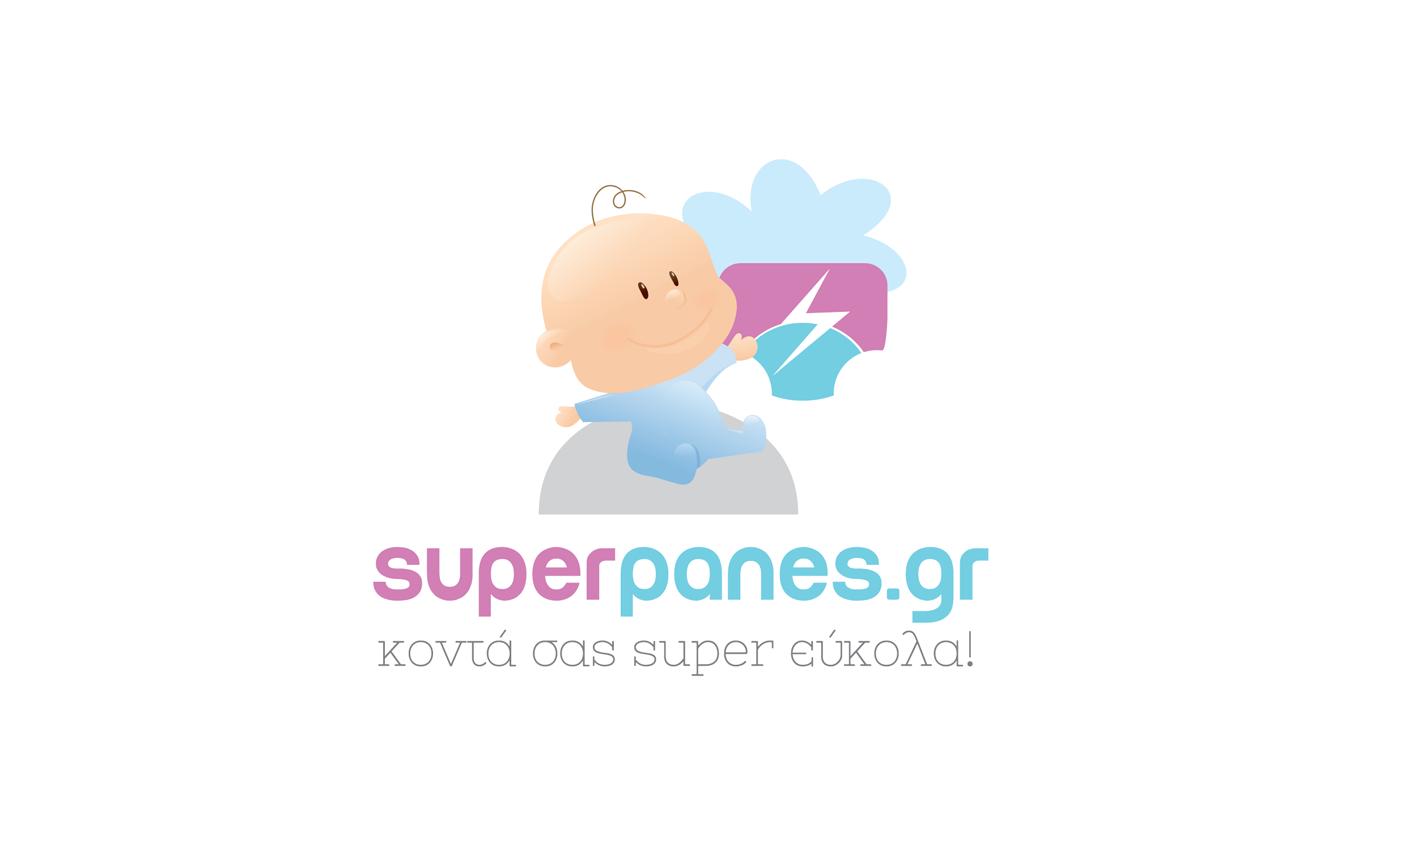 Superpanes.gr